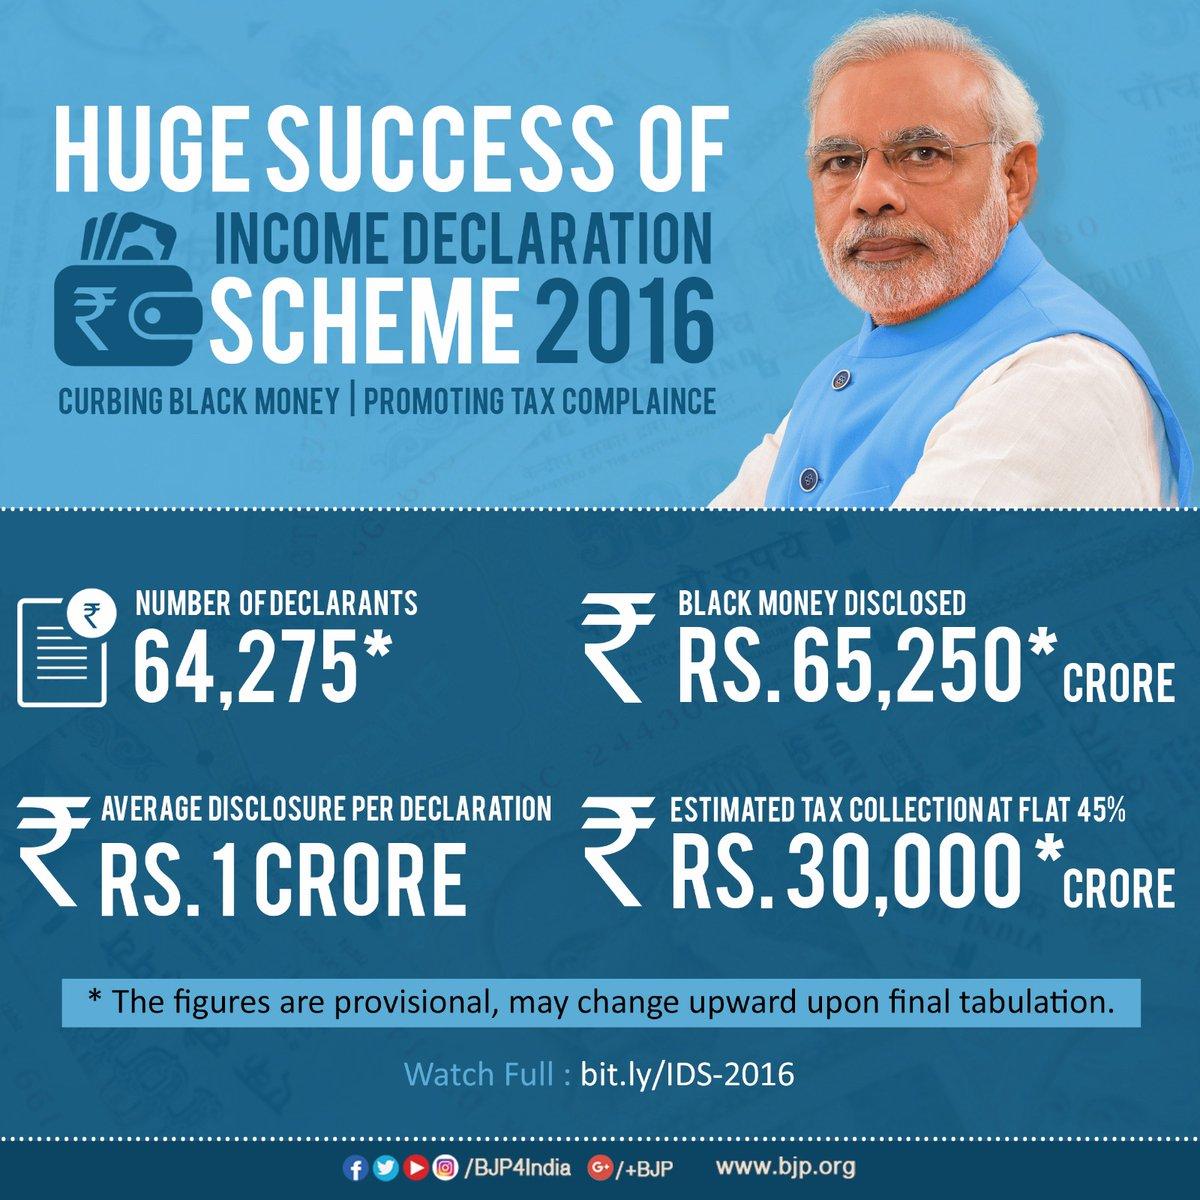 Huge success of the Income declaration scheme 2016.   #TransformingIndia https://t.co/5aMi2byshR